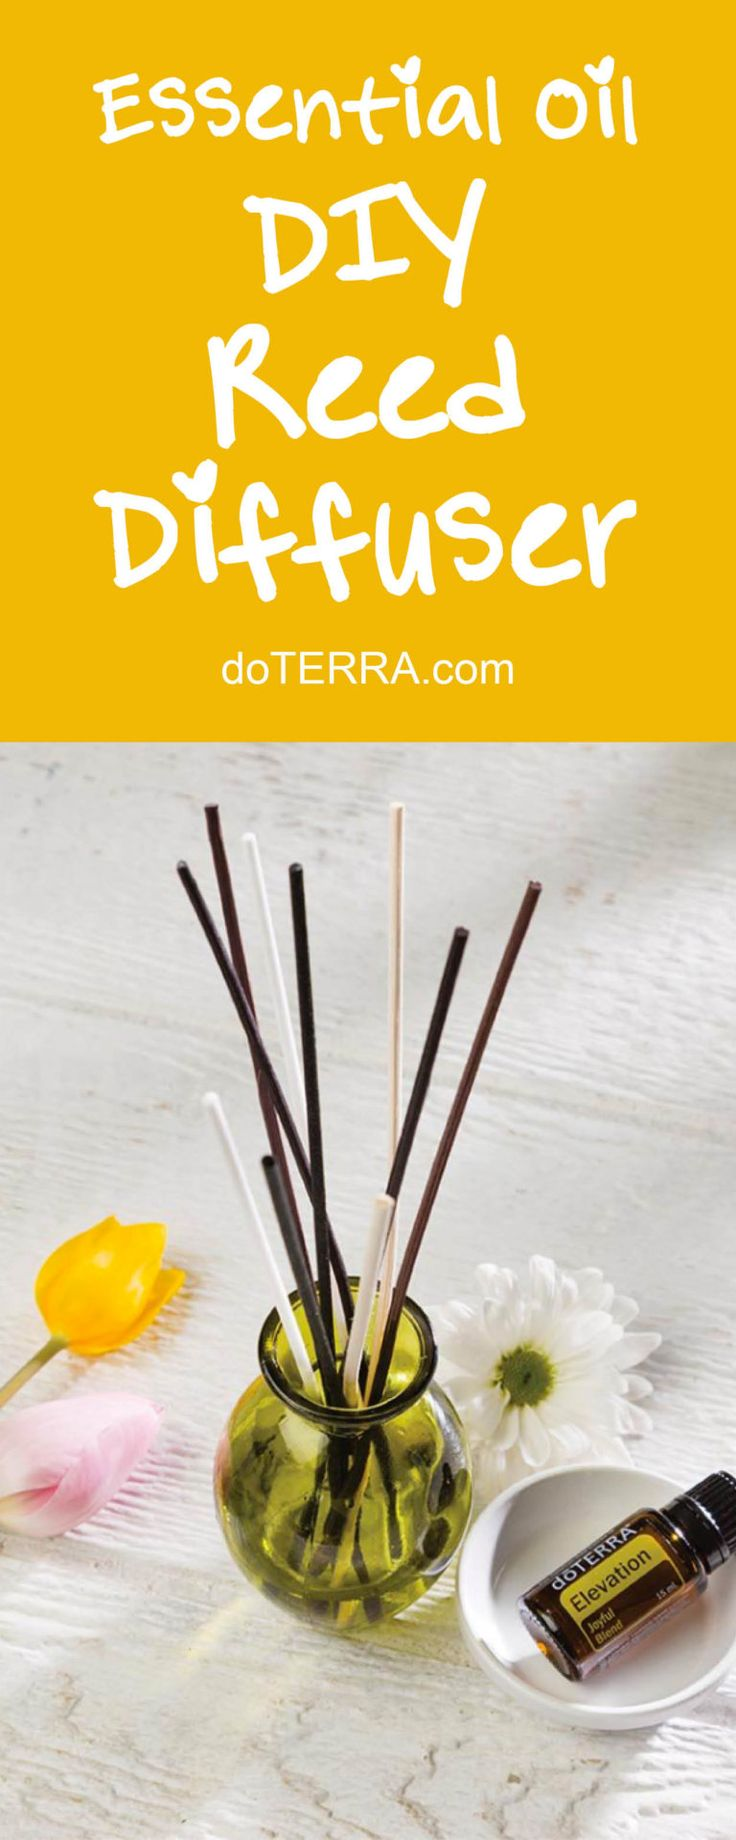 doTERRA Essential Oils DIY Reed Diffuser Recipe